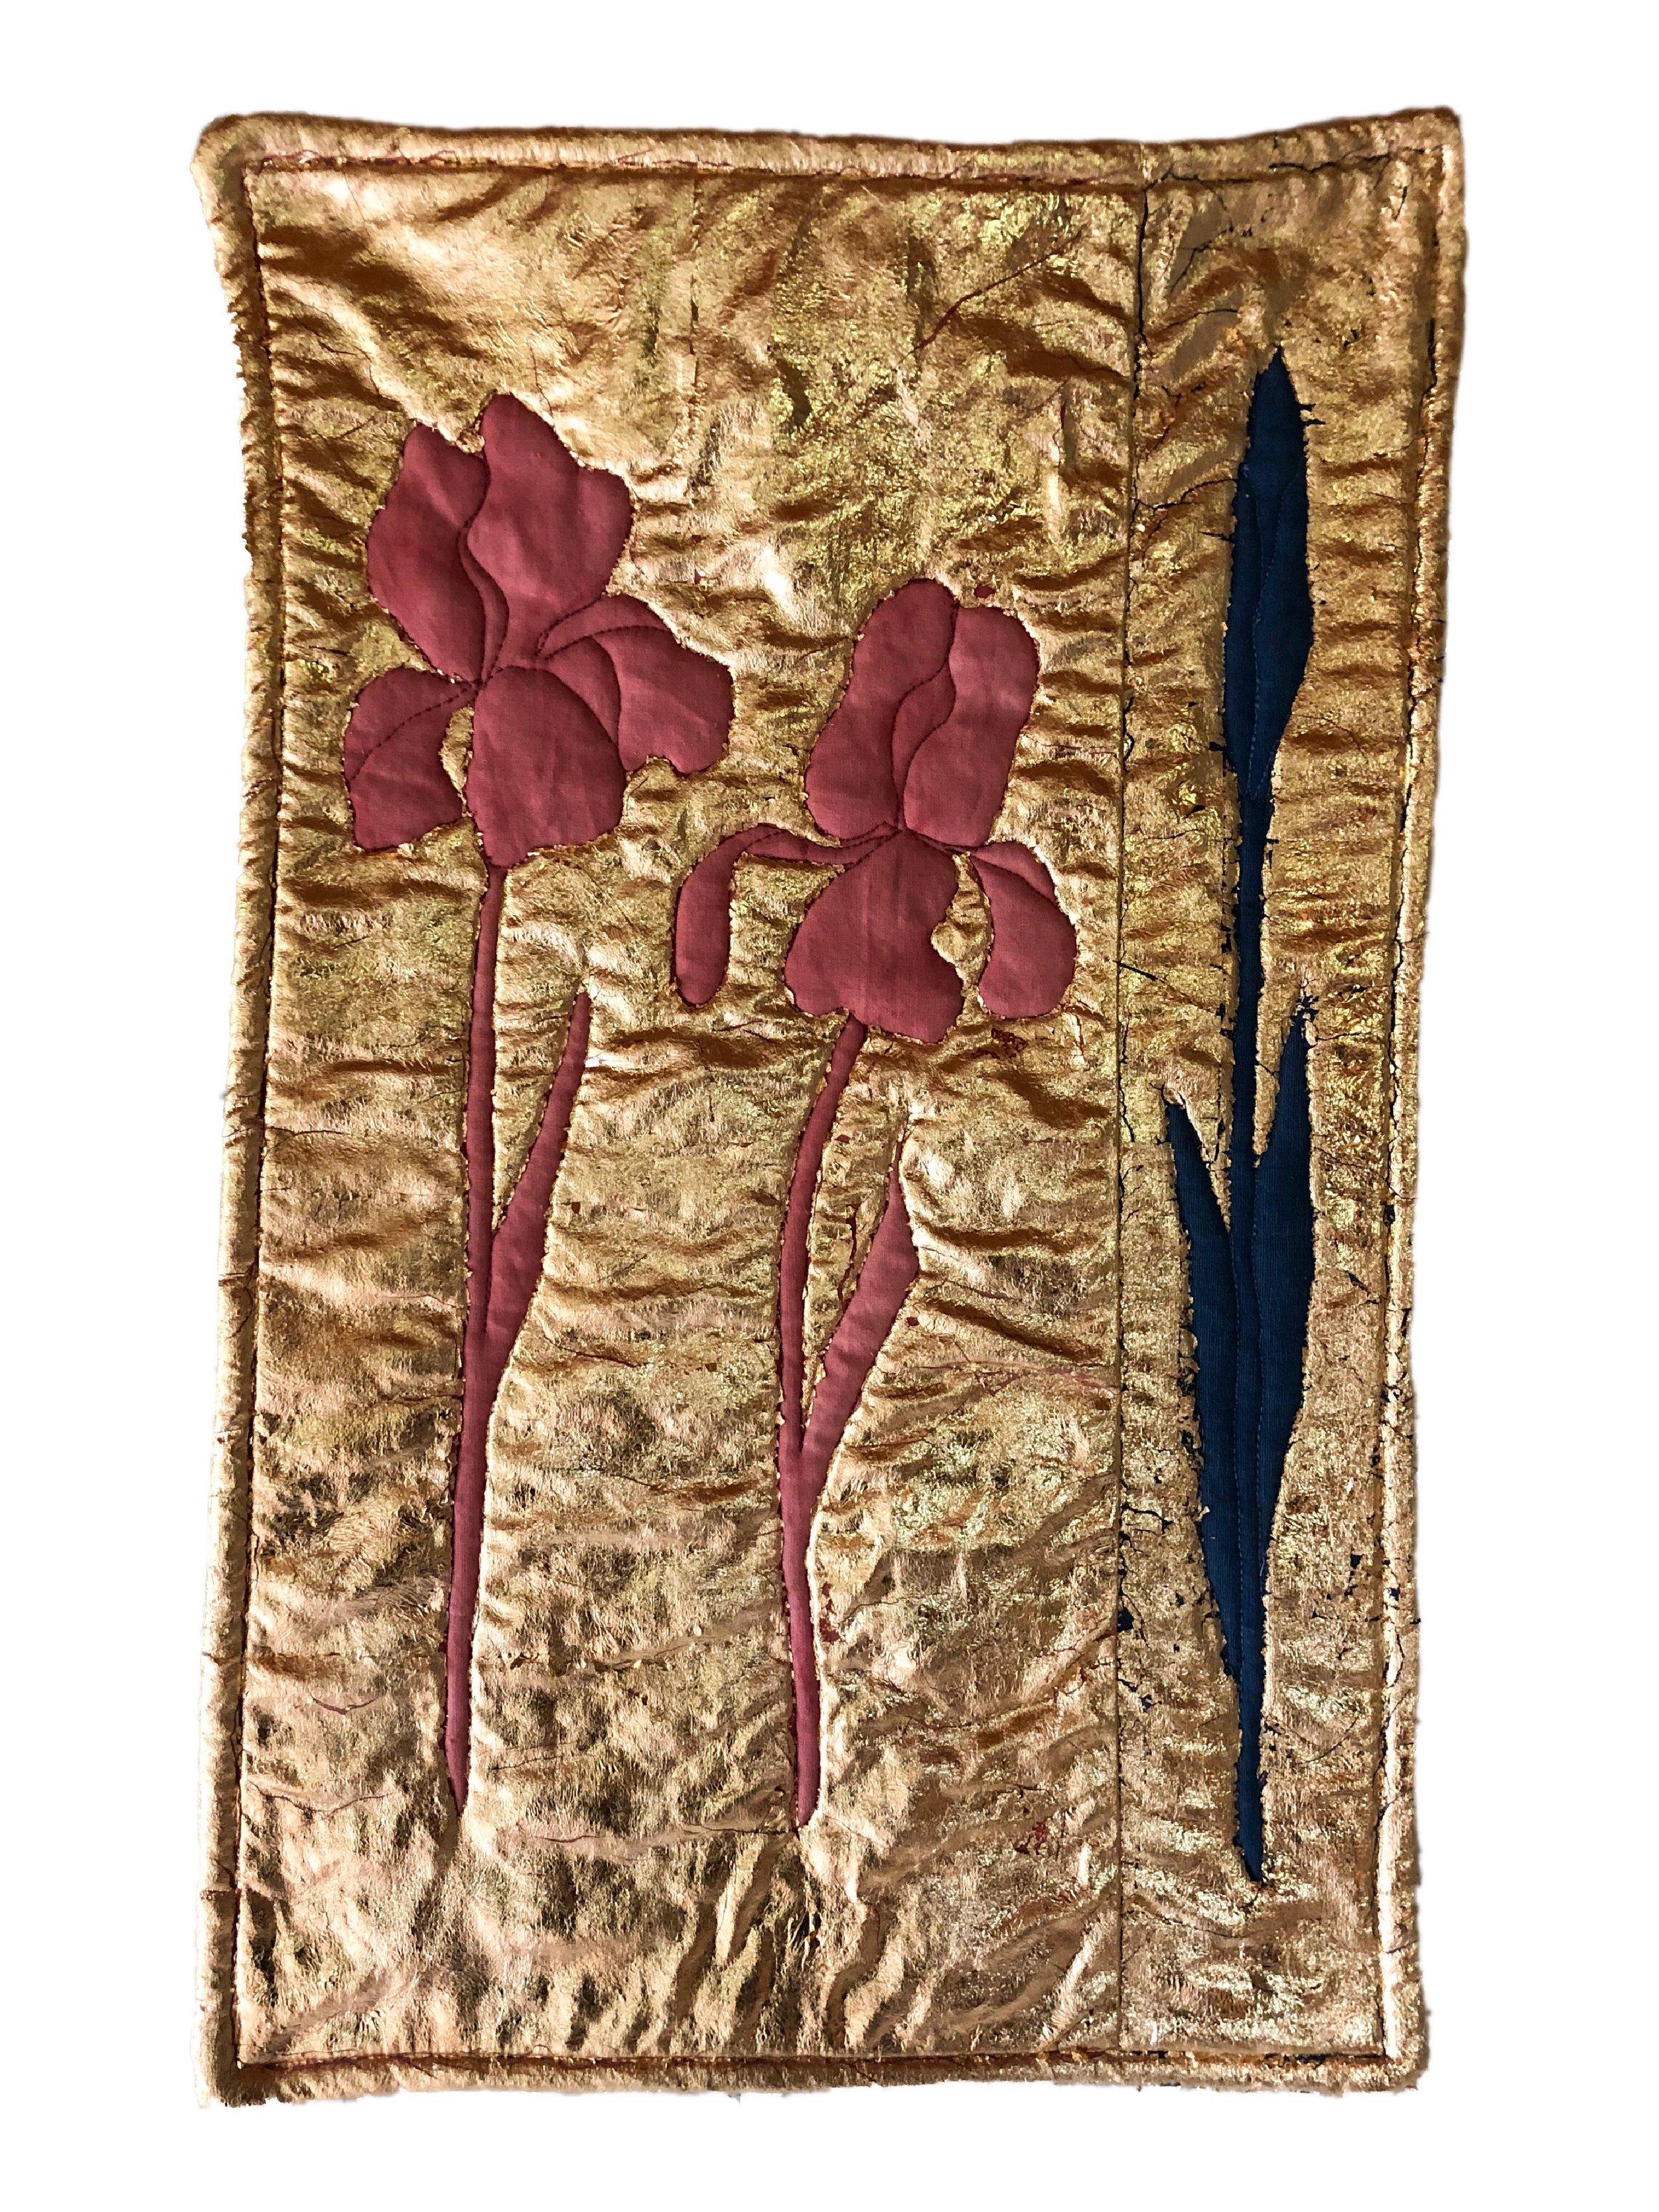 Grandma Patty's Heirloom Irises